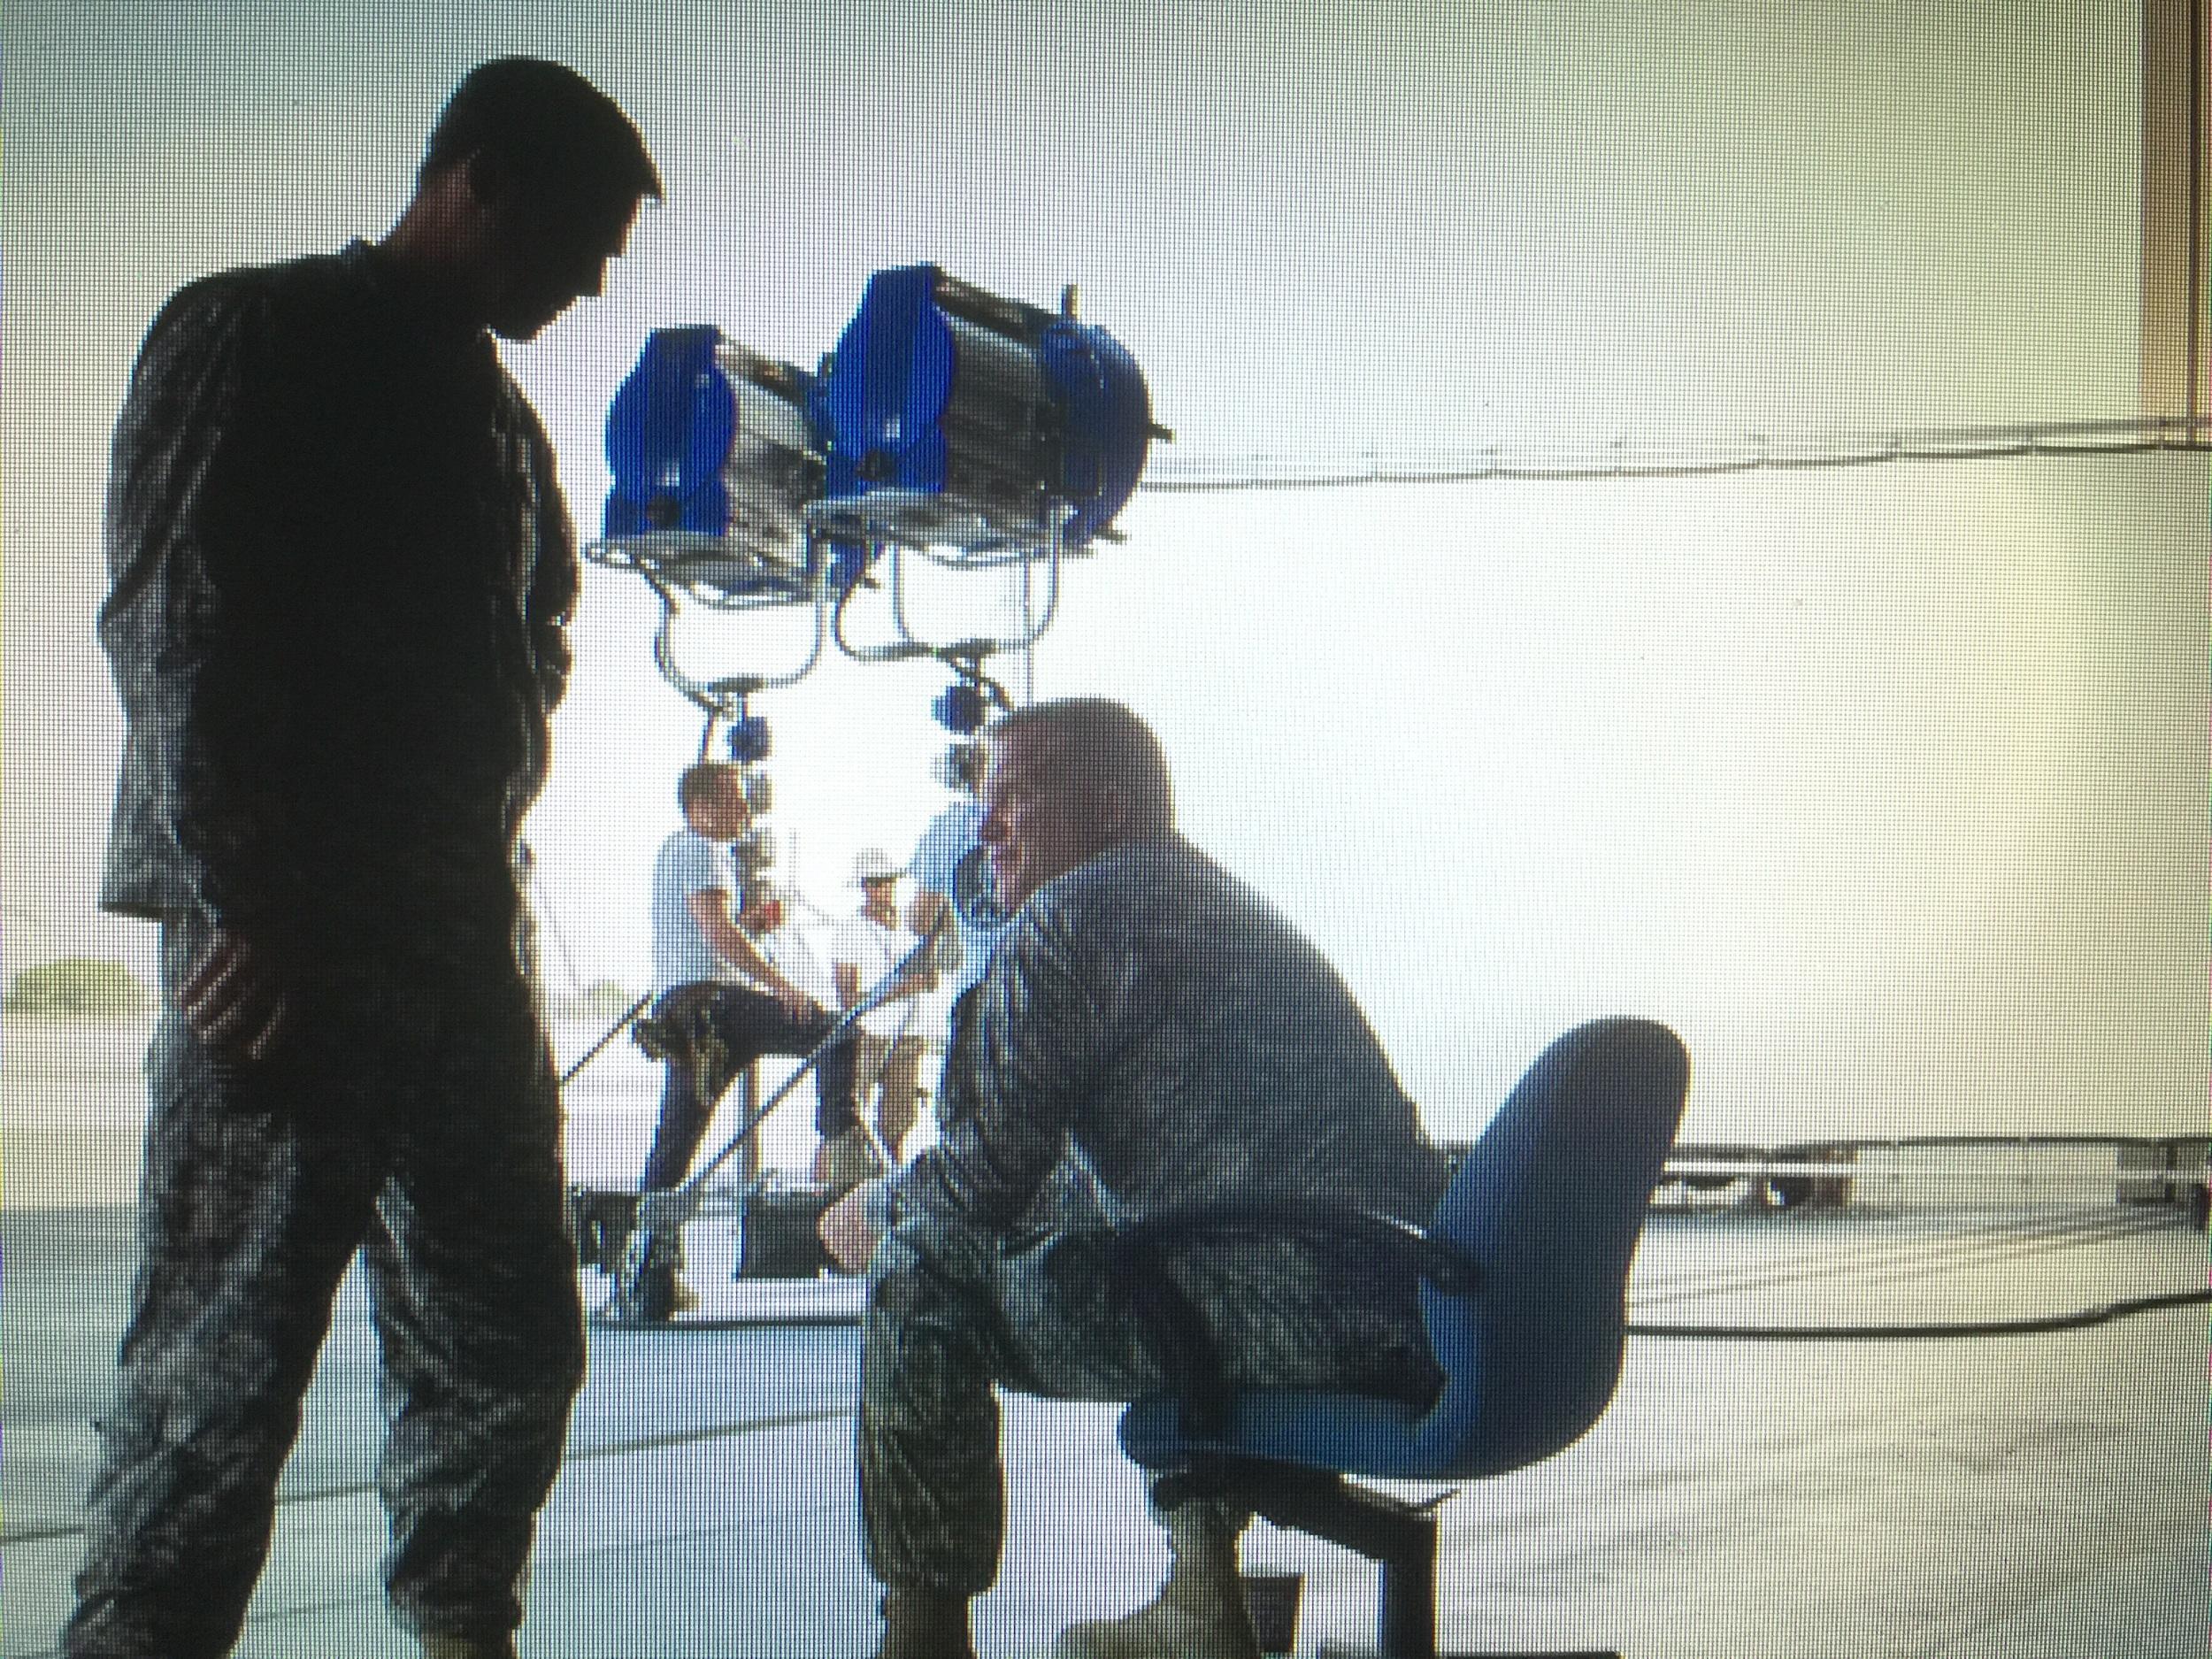 Pitt and Hall on set in RAK, U.A.E. Sept. 2015.